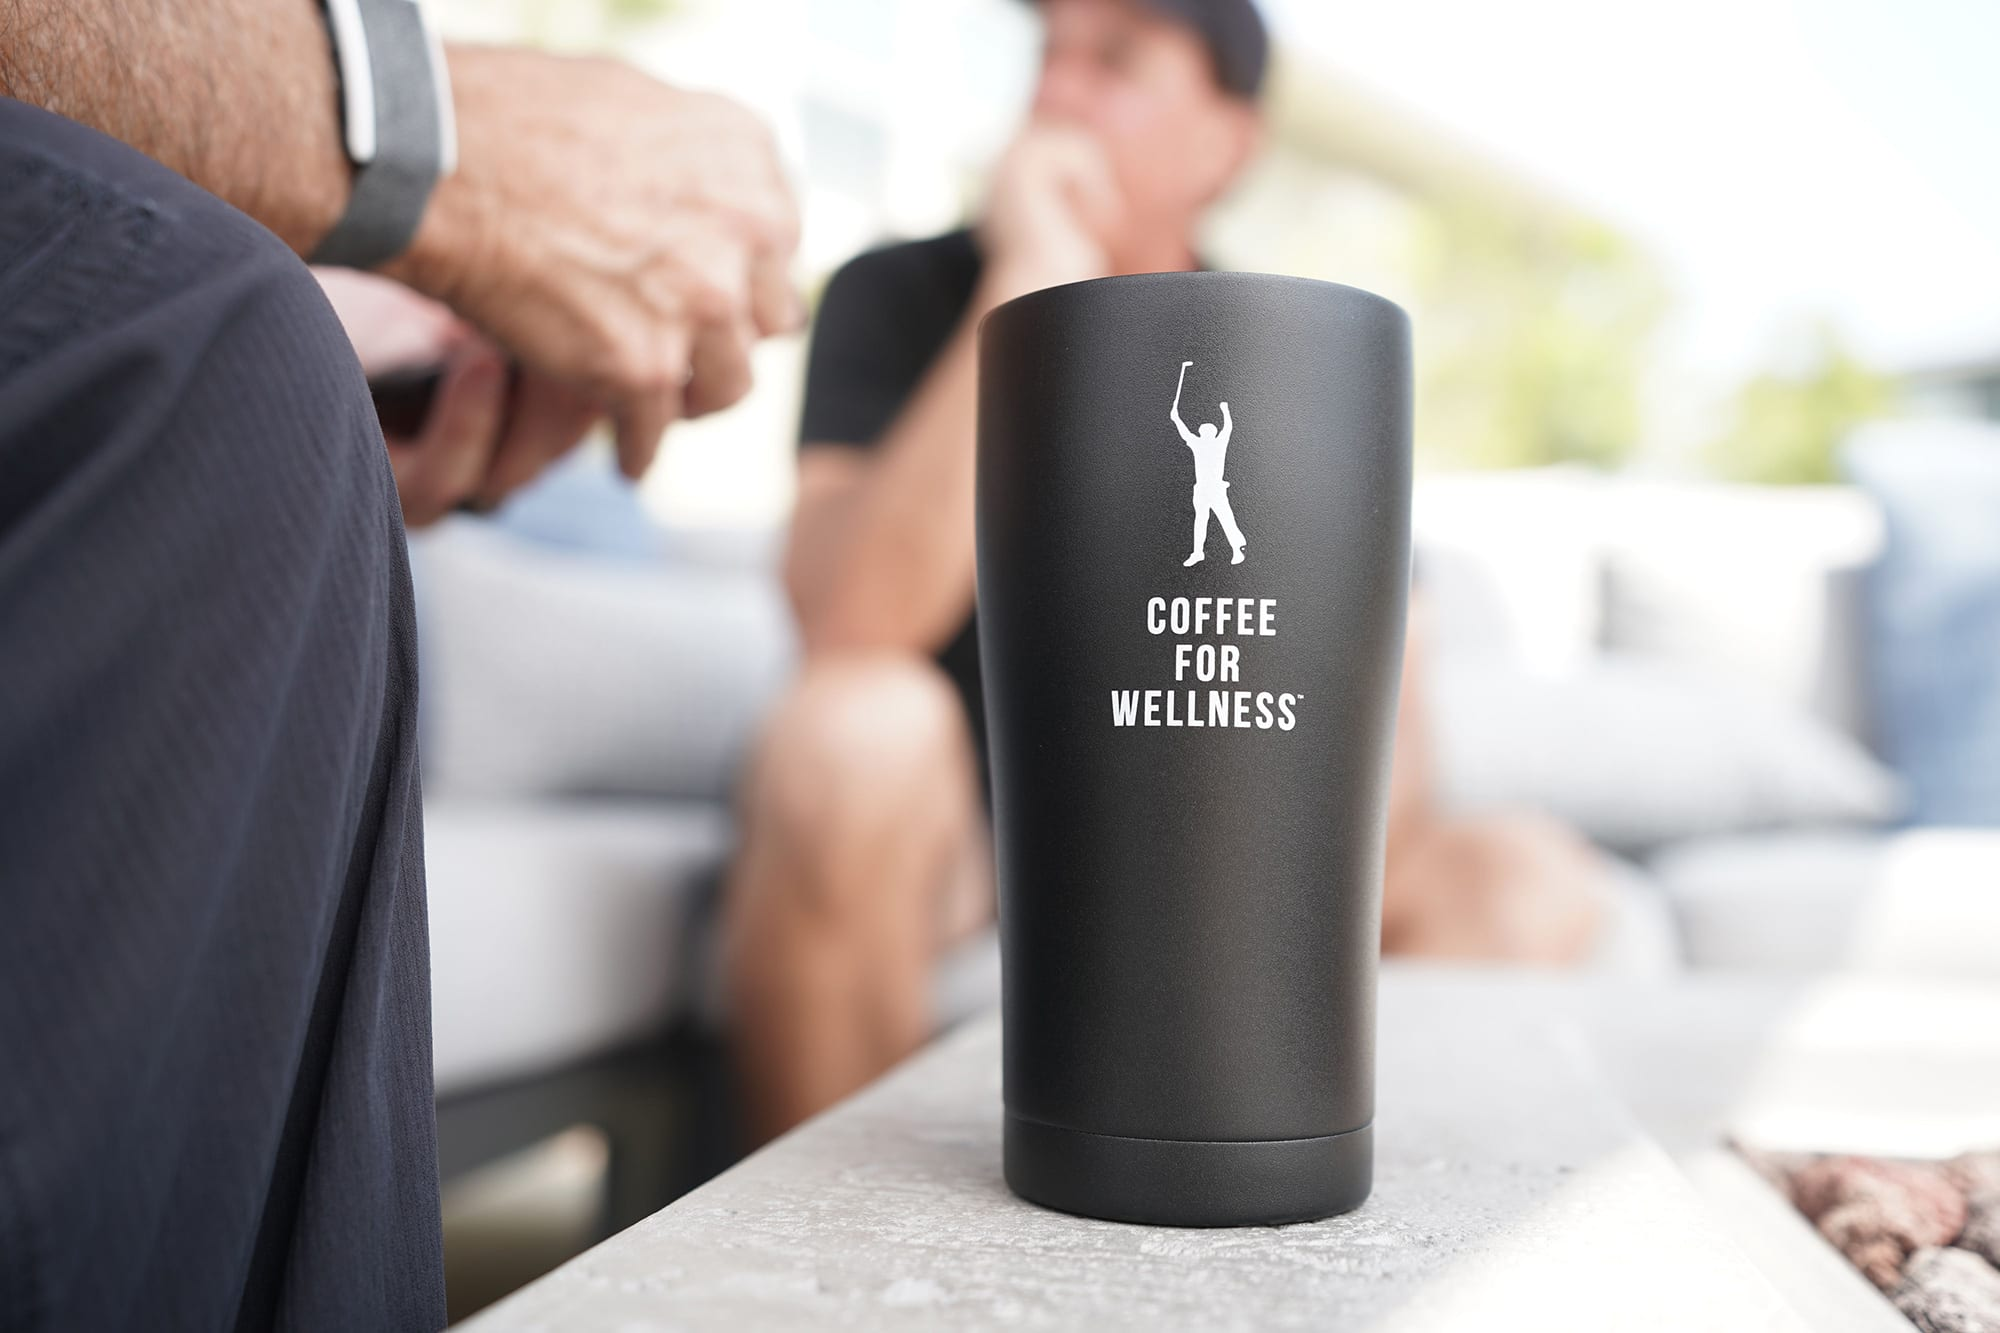 Coffee for Wellness black Phil Mickelson coffee mug